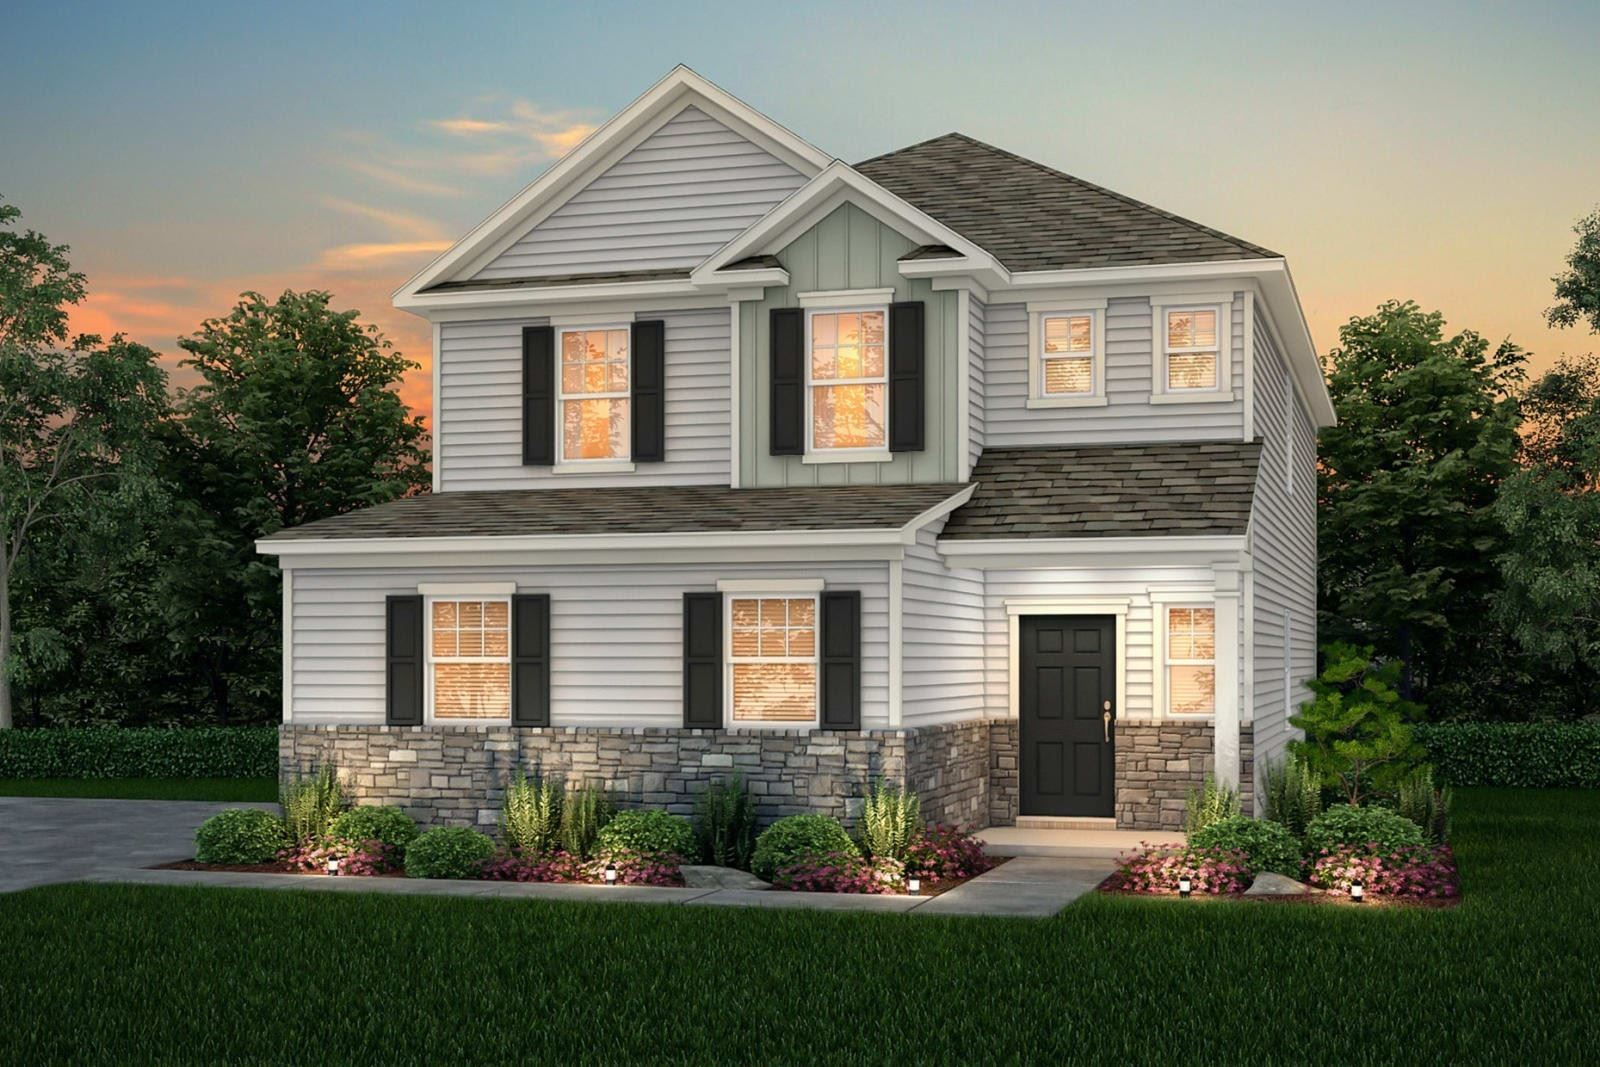 3019 Posada Court SE, Spring Hill, TN 37174 - MLS#: 2286661